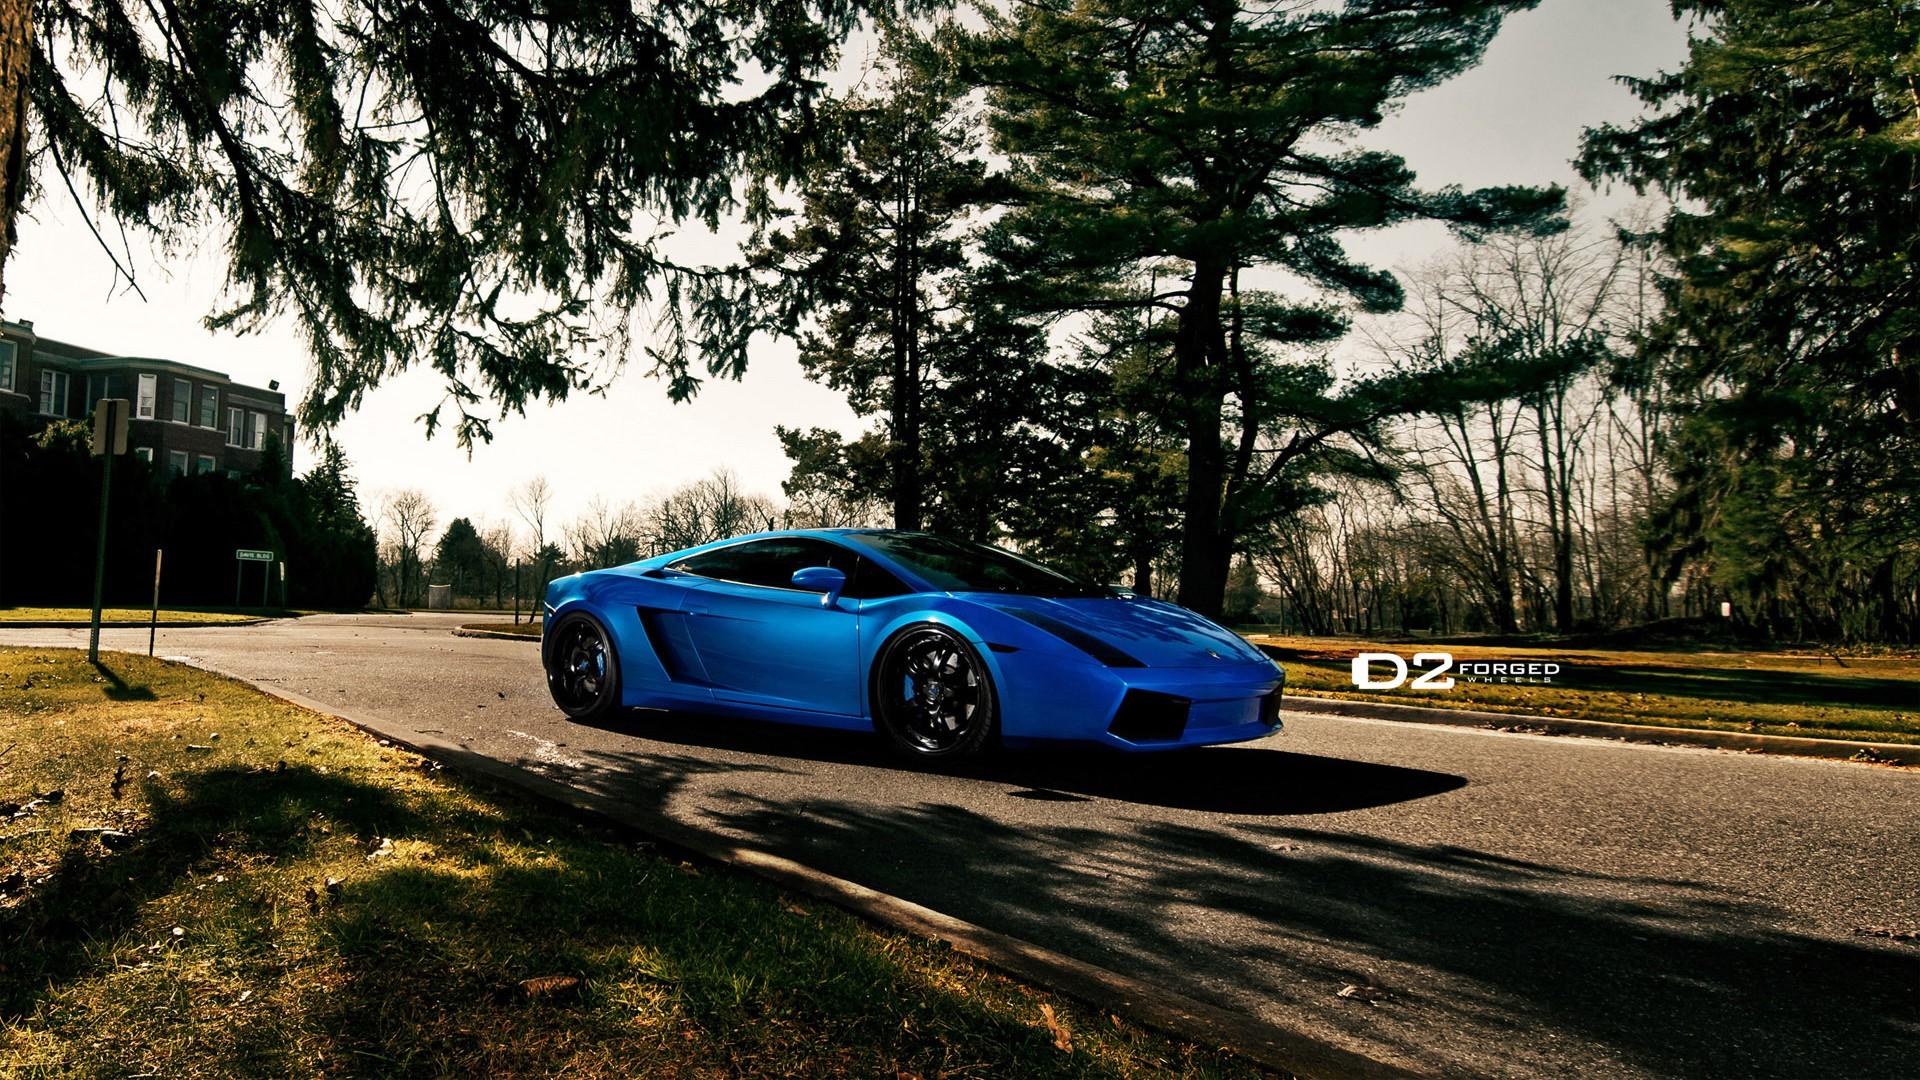 Audi Vs BMW >> Lamborghini Gallardo D2Forged VS6 Wheels 5 Wallpaper | HD ...